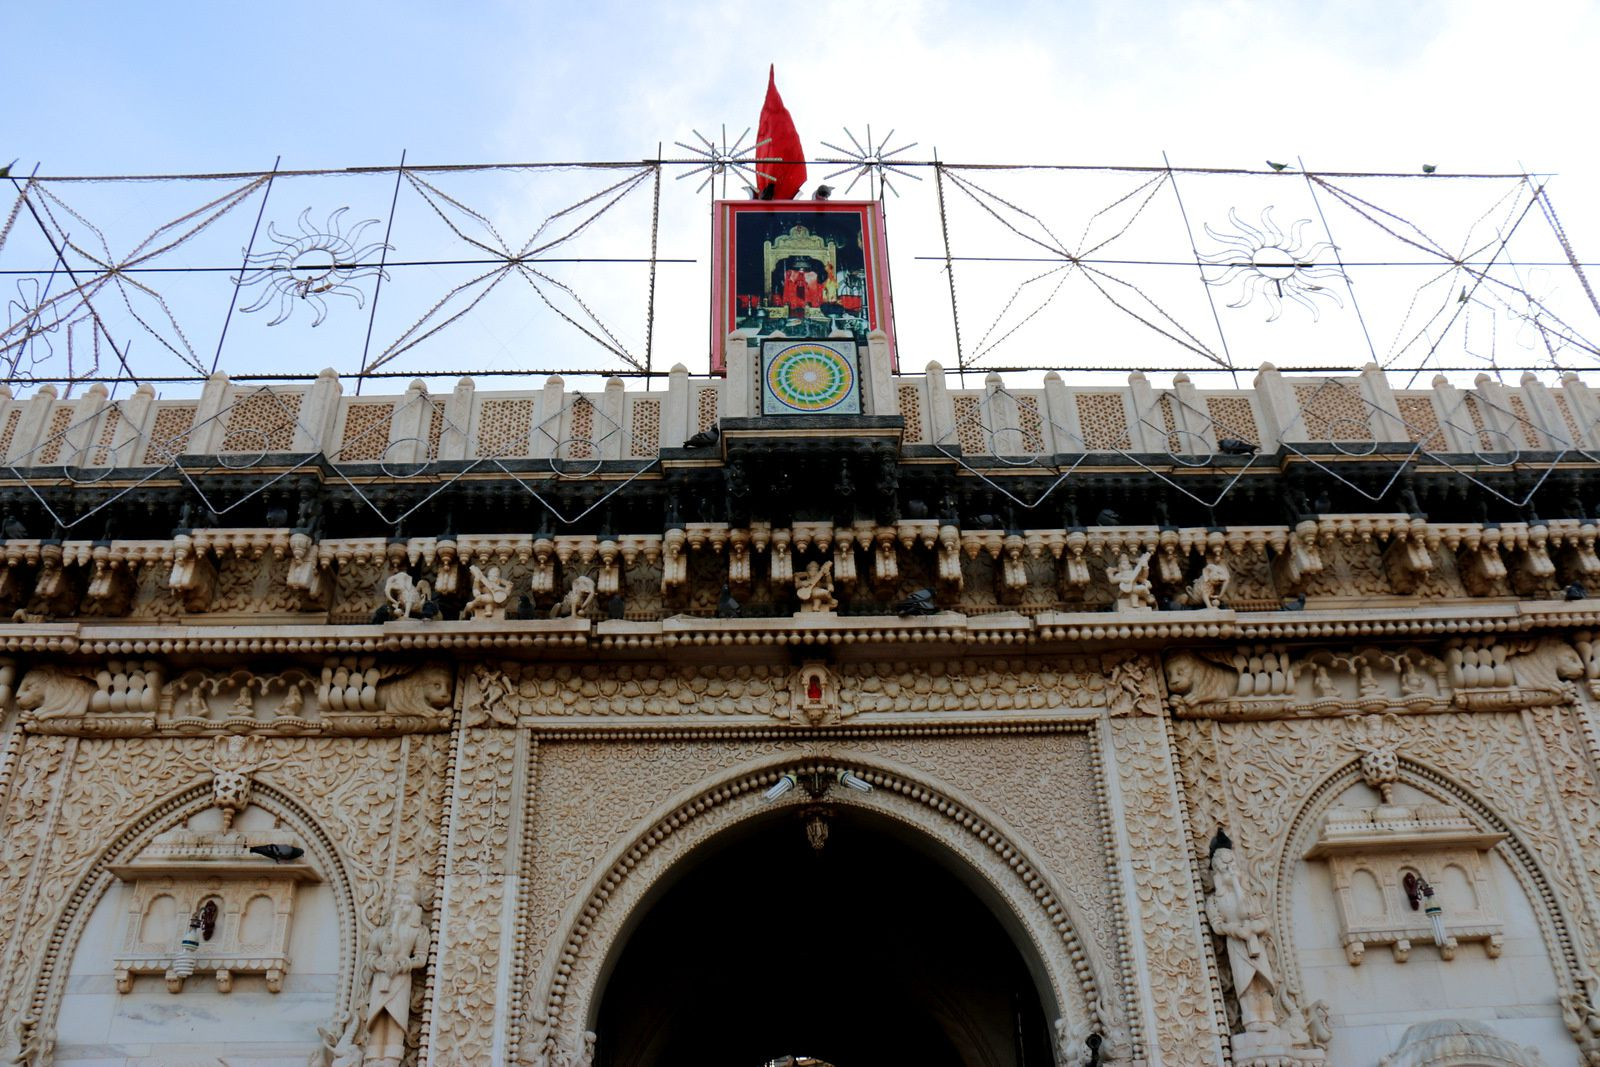 Le temple de Karni Mata (Temple des Rats), Deshnoke (Inde)